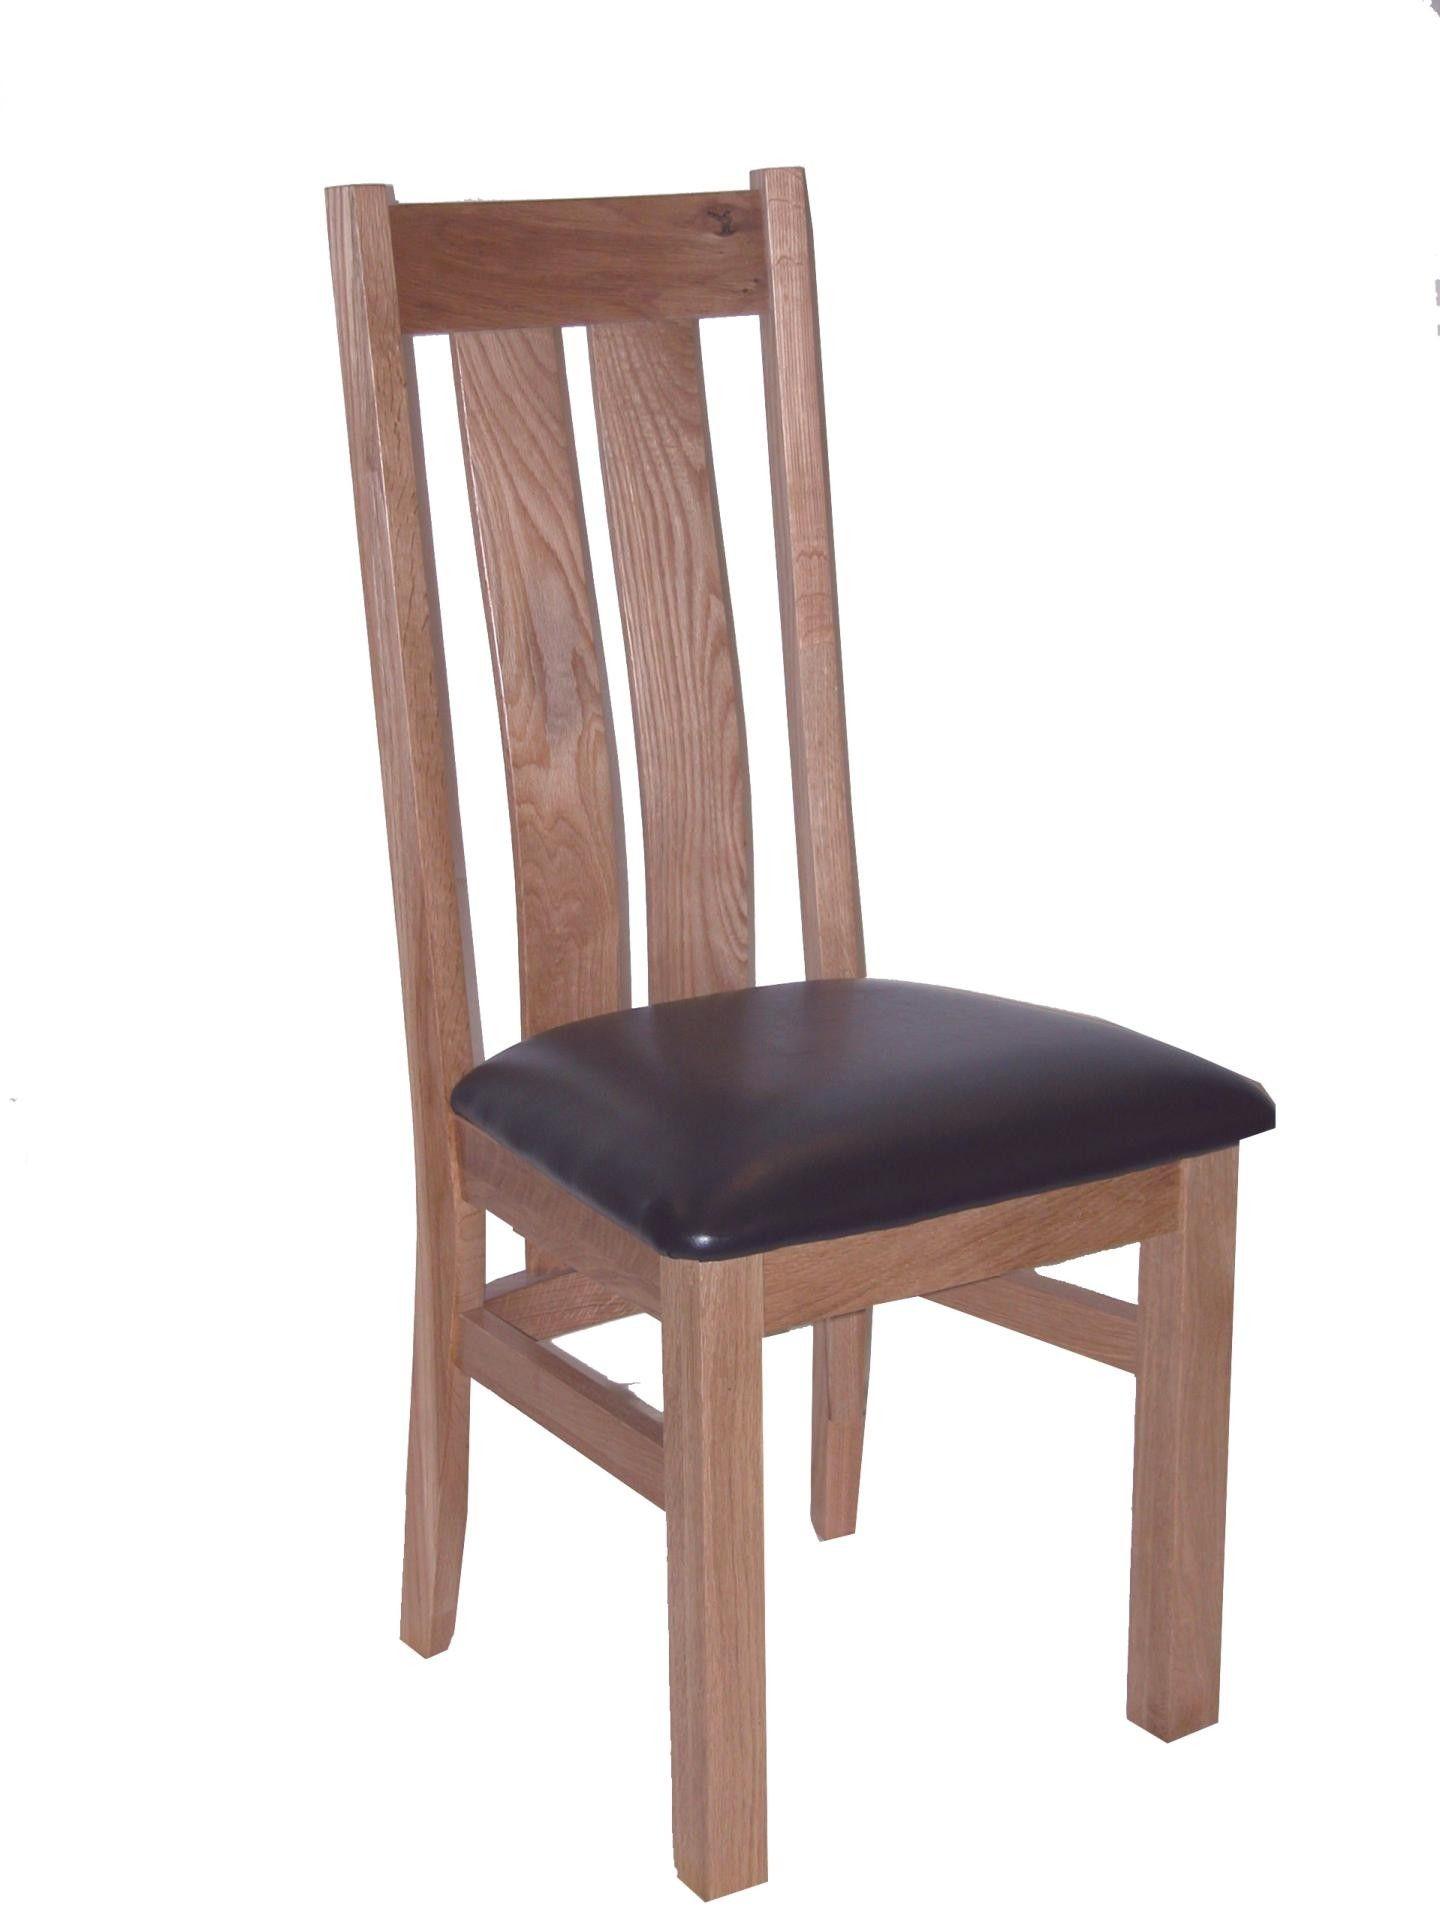 slat back chairs. bryer oak slat back chair chairs b